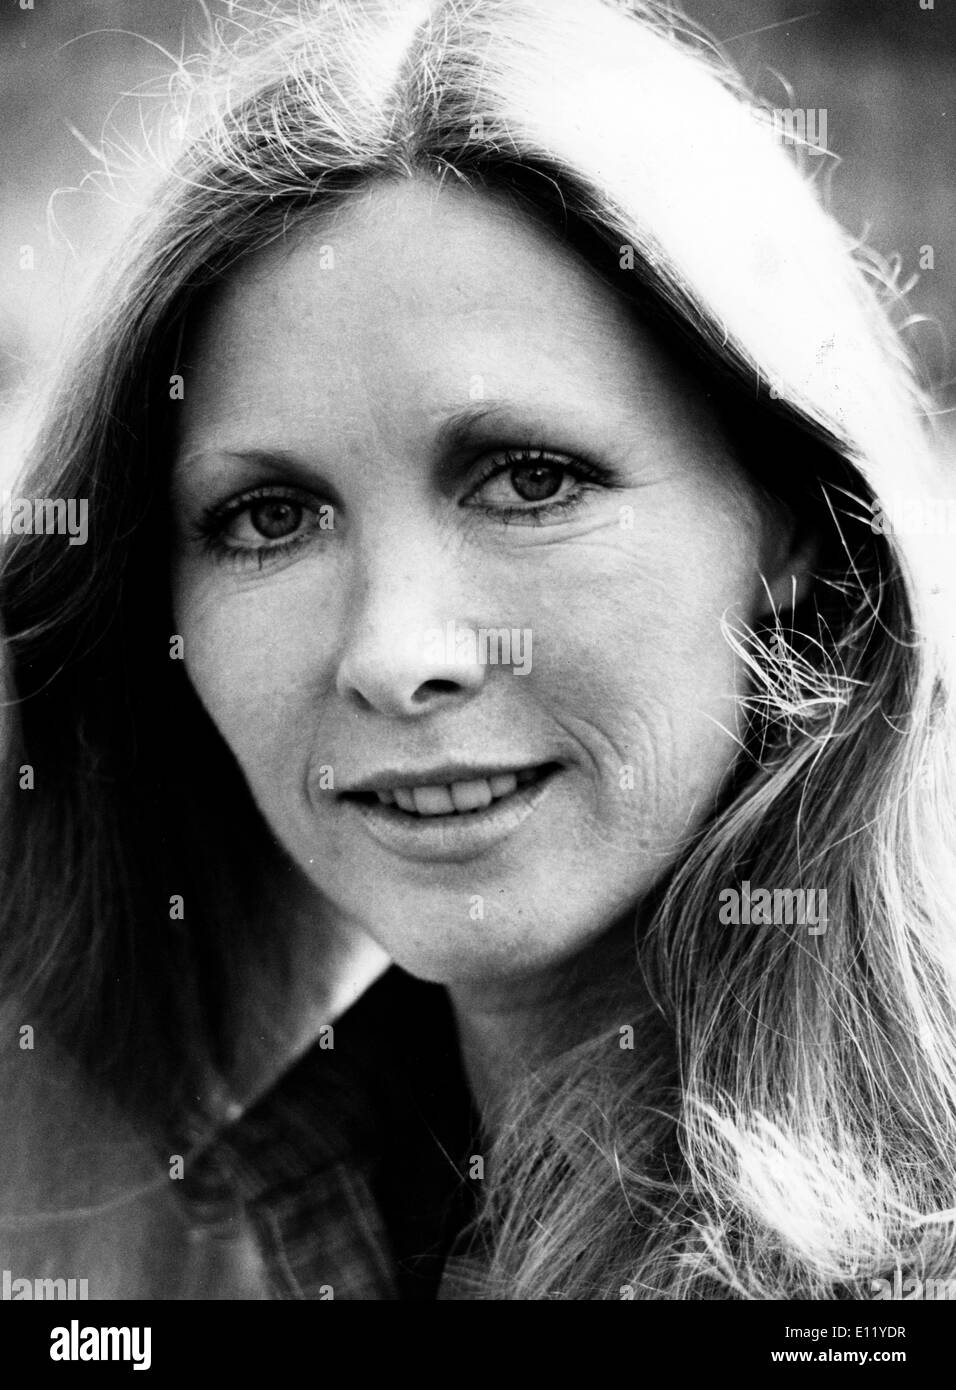 Jaya Ramsey (b. 1969),Philippa Baker (actress) Sex pics & movies August Schellenberg,Emilia Fox (born 1974)